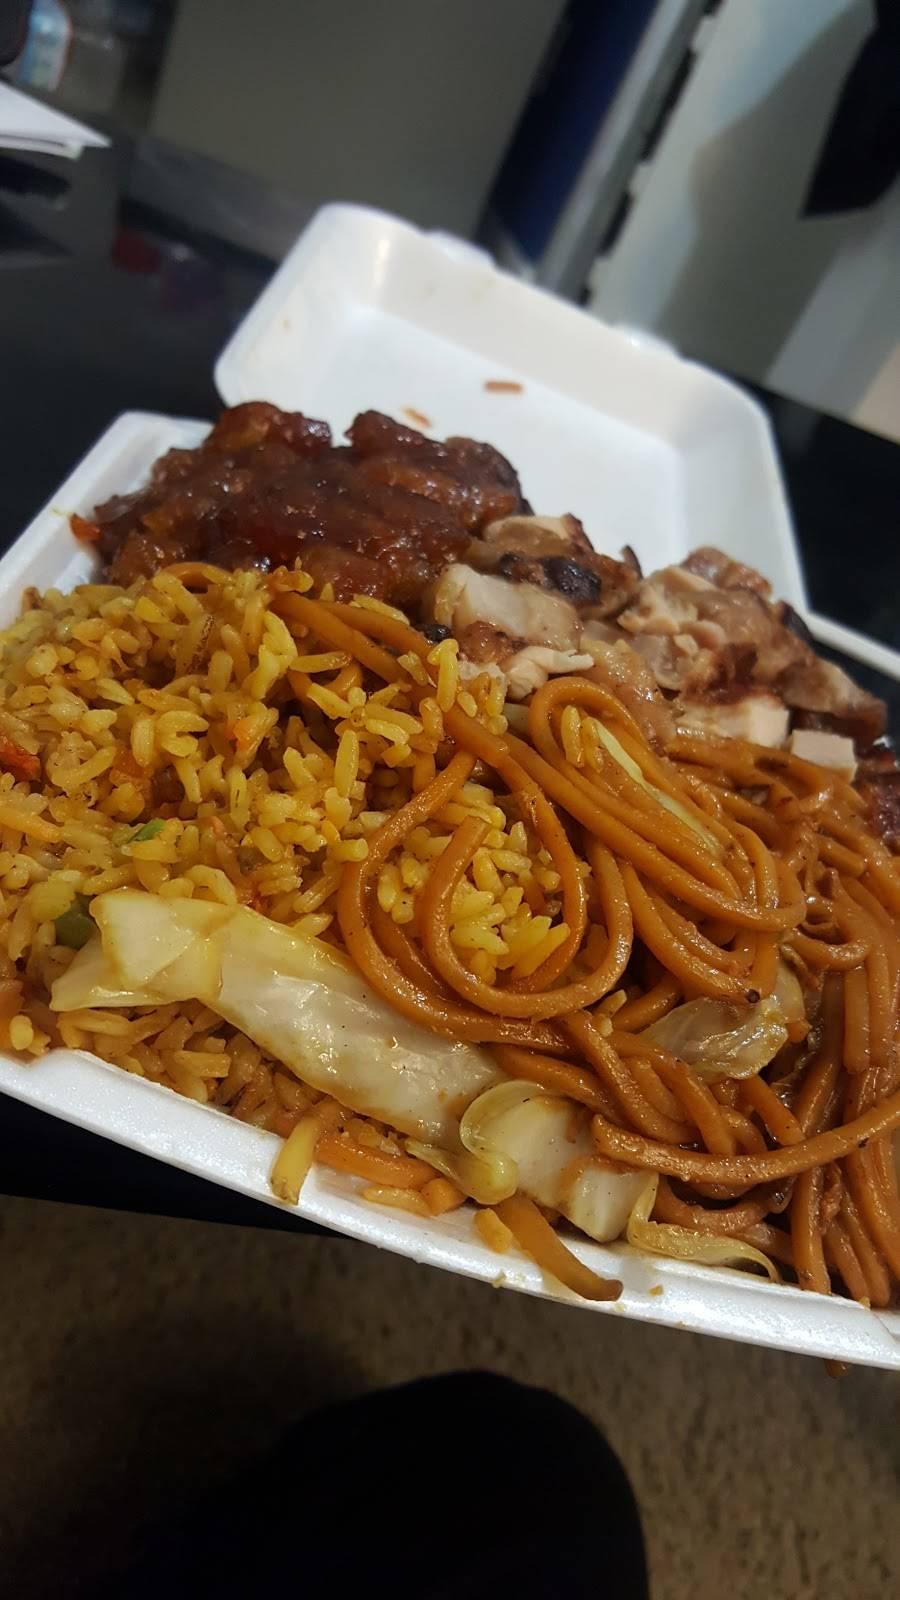 China Express   restaurant   920 S Euclid St, Anaheim, CA 92802, USA   7147780682 OR +1 714-778-0682